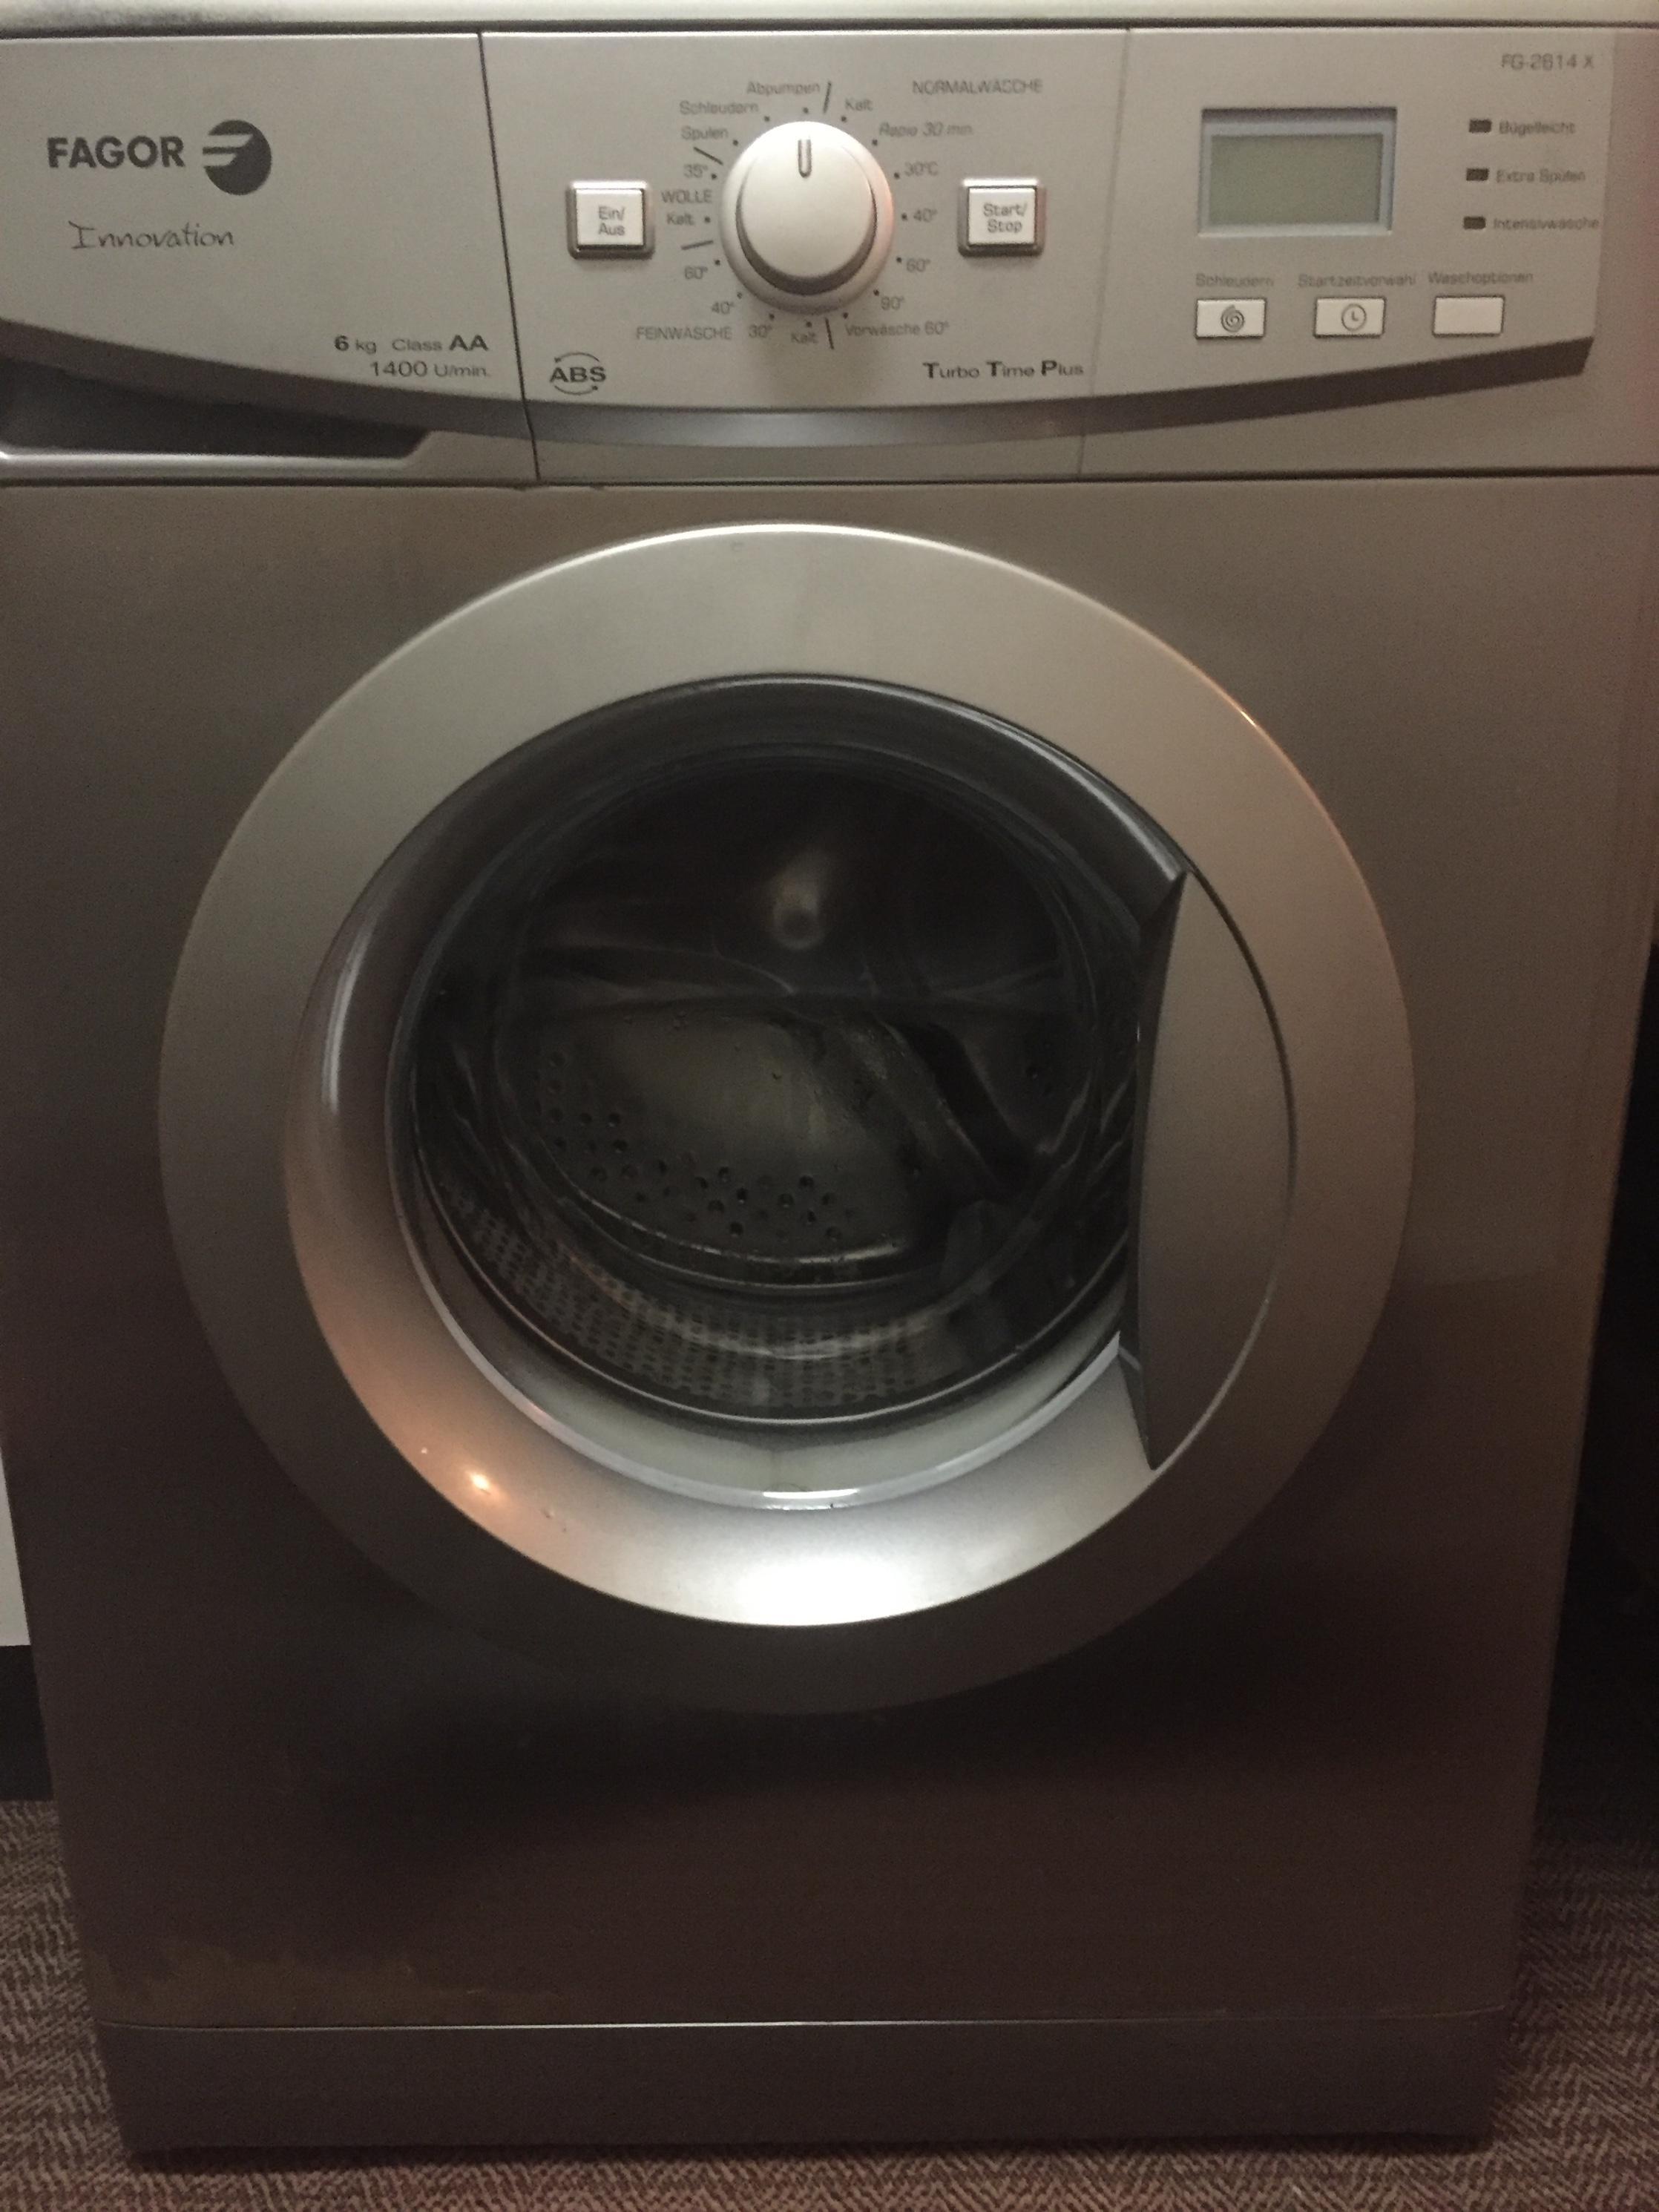 Gebraucht fagor waschmaschine fg teiledefekt in